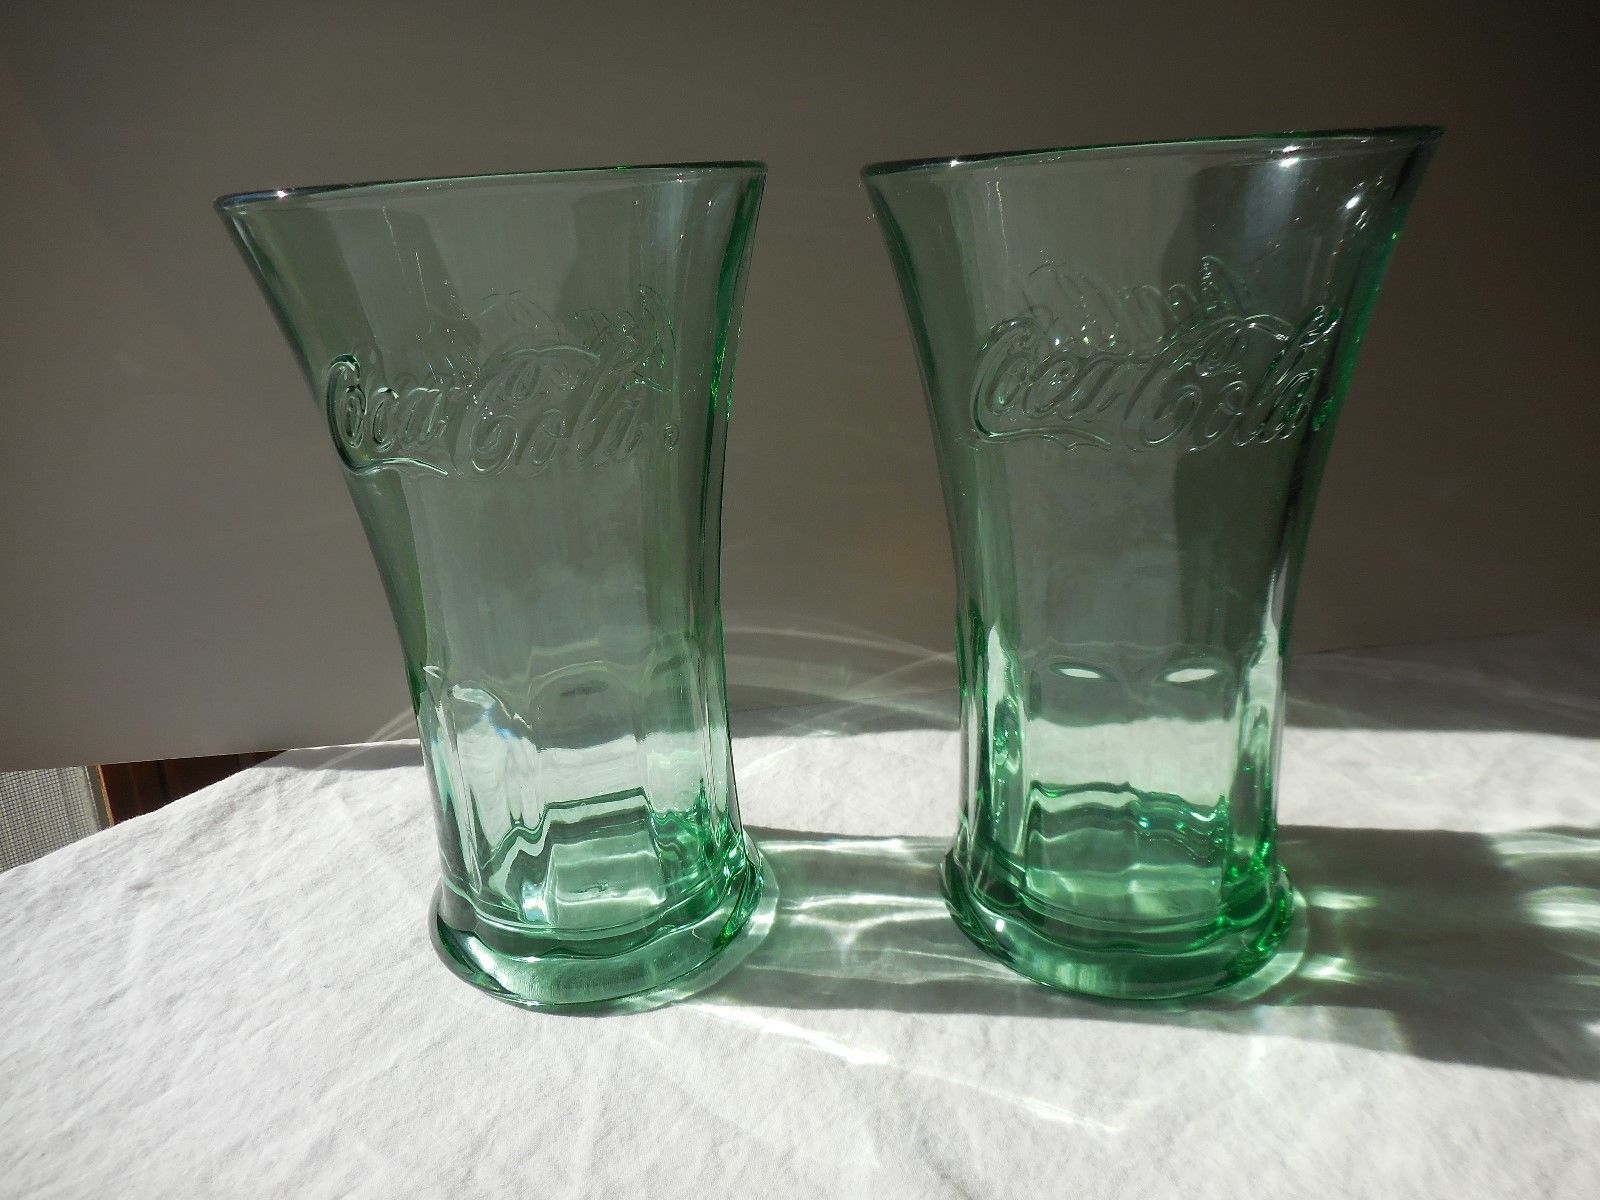 Vintage Libbey Coca-Cola Heavy Drinking Glass Handle Mug 16 Oz Clear Coke